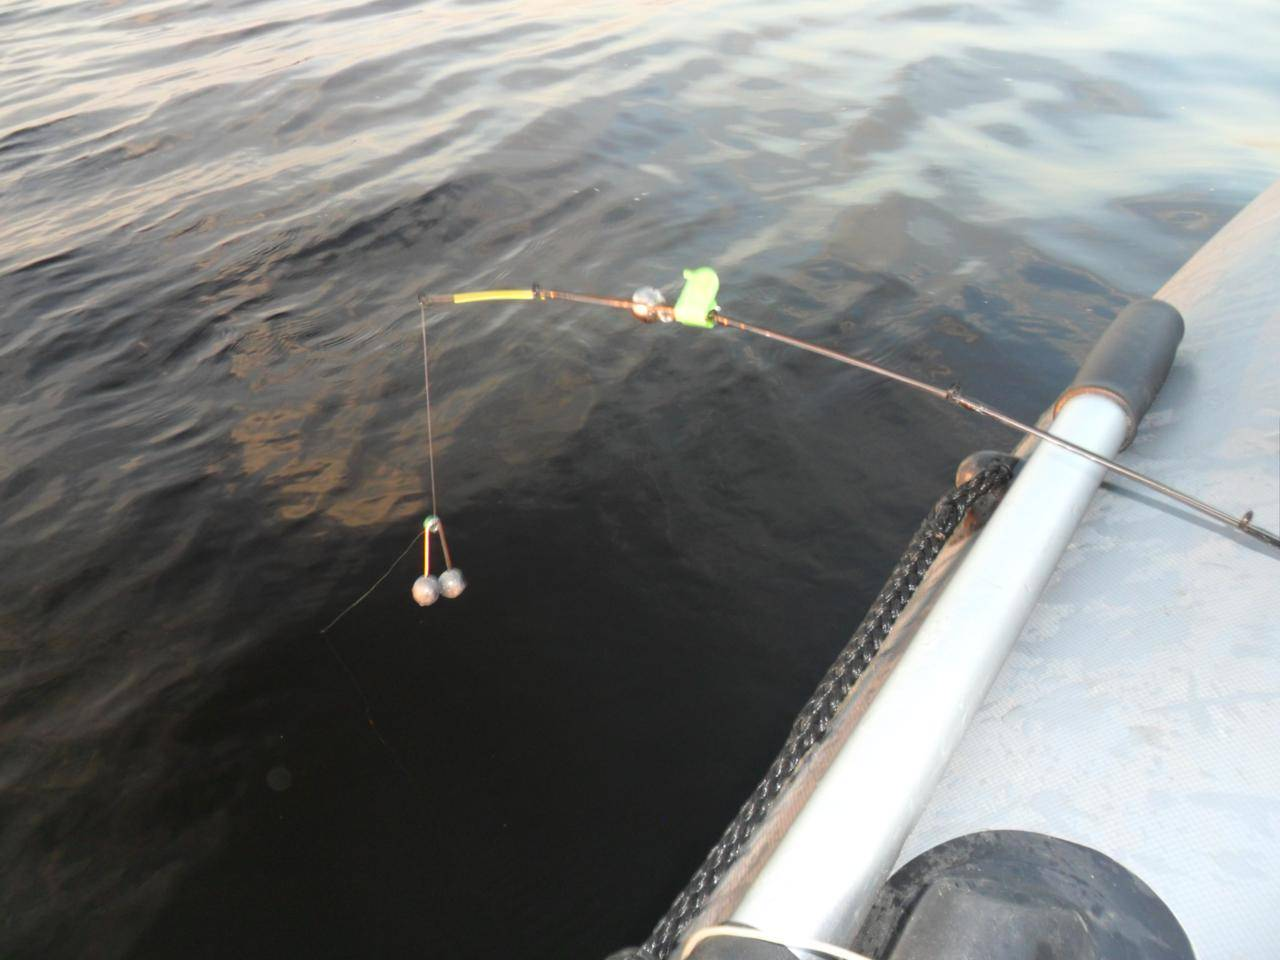 Удочка для ловли с лодки на реке